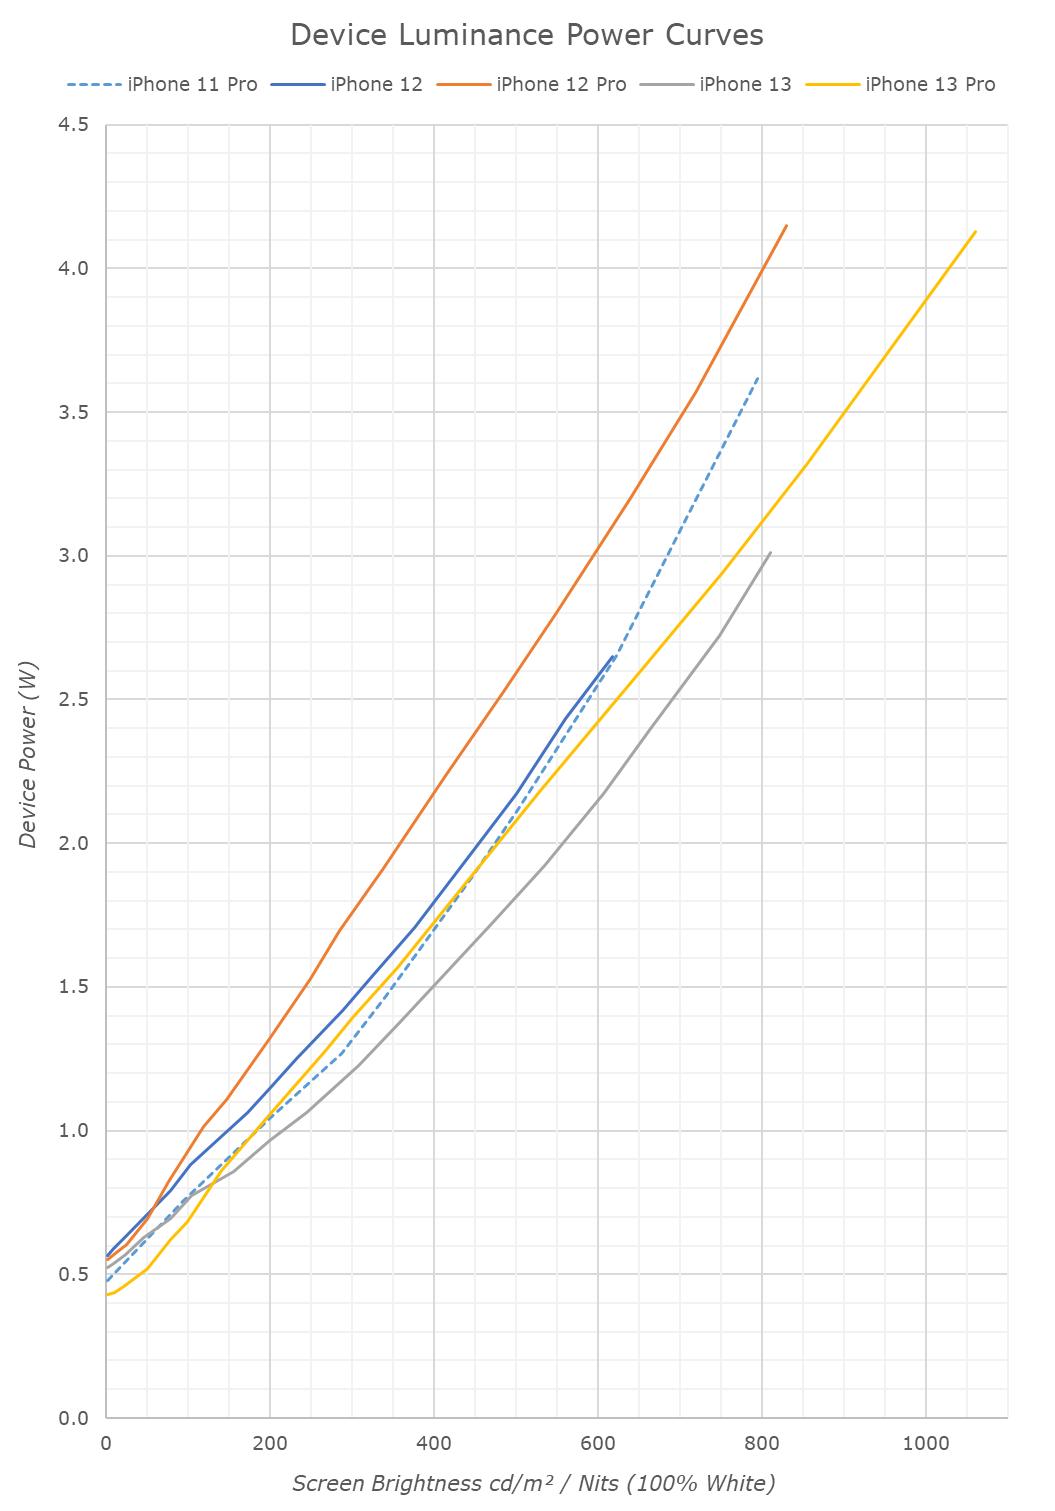 iPhone 13, 13 Pro и 13 Pro Max сравнили по автономности с Android-смартфонами разных лет выпуска